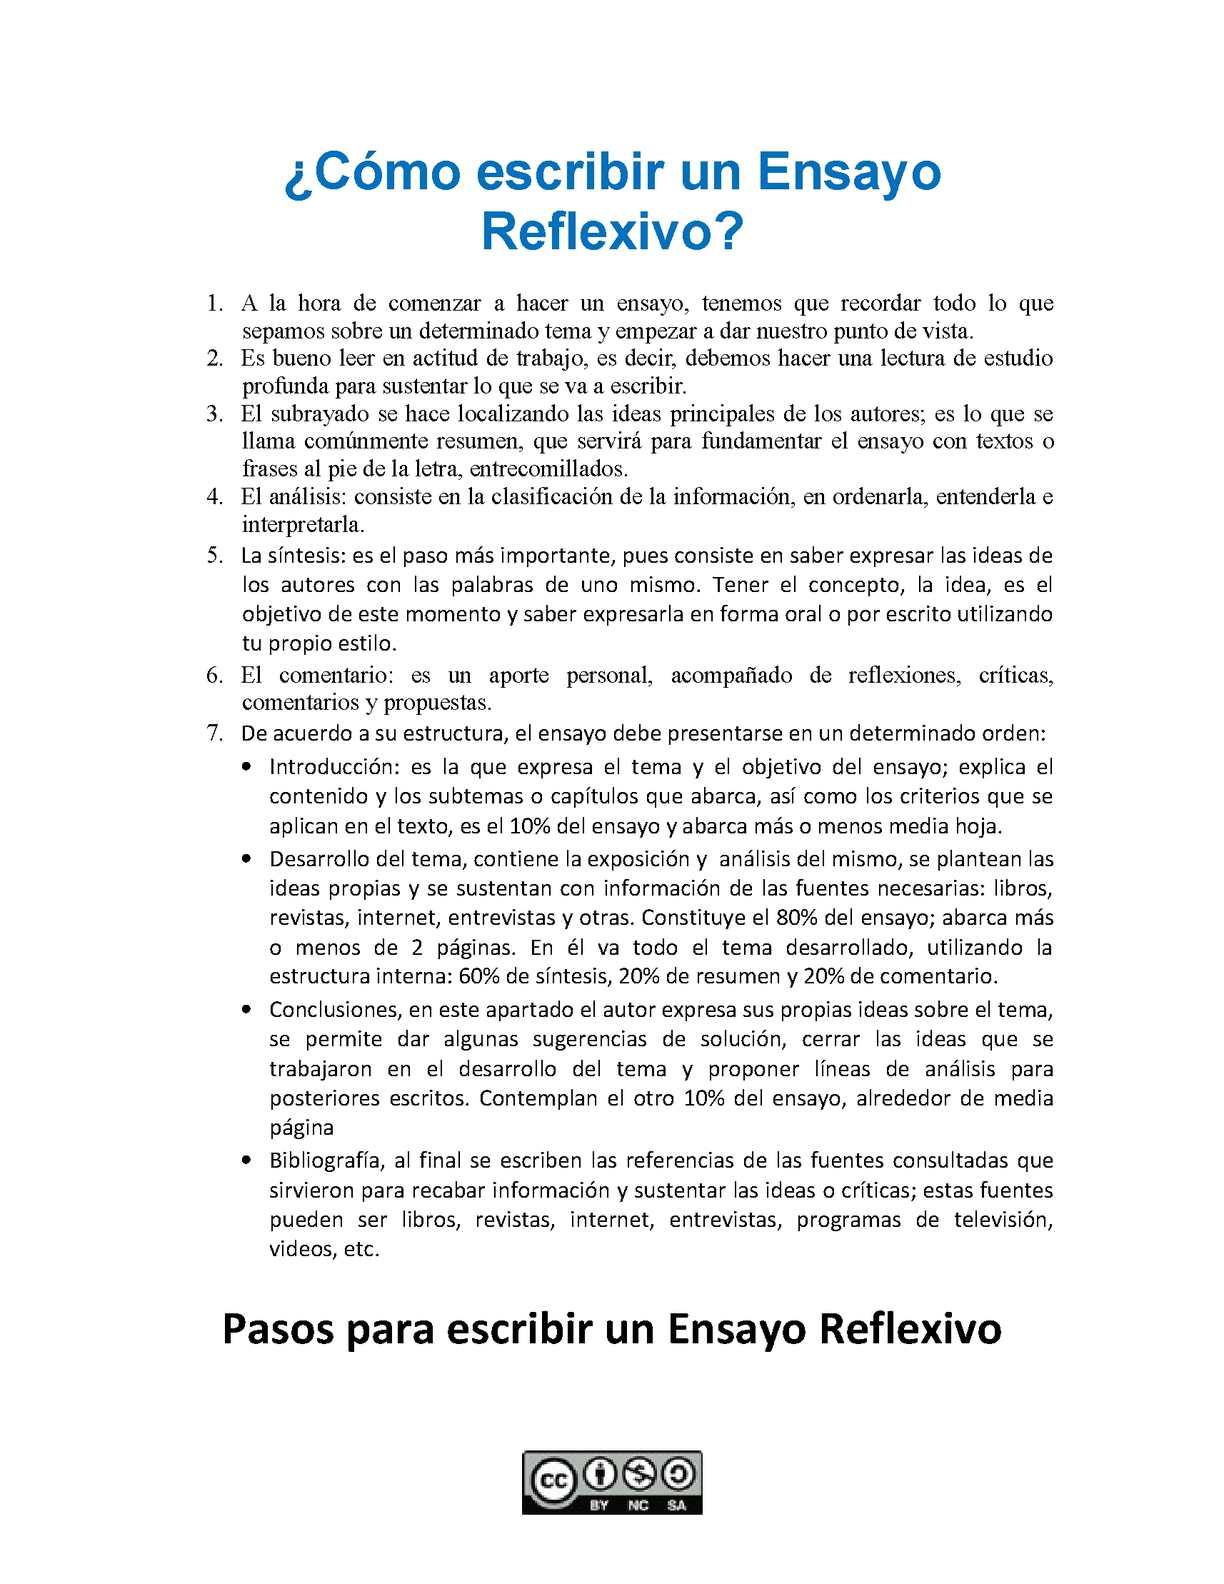 Calaméo - ¿Cómo hacer un ensayo reflexivo?